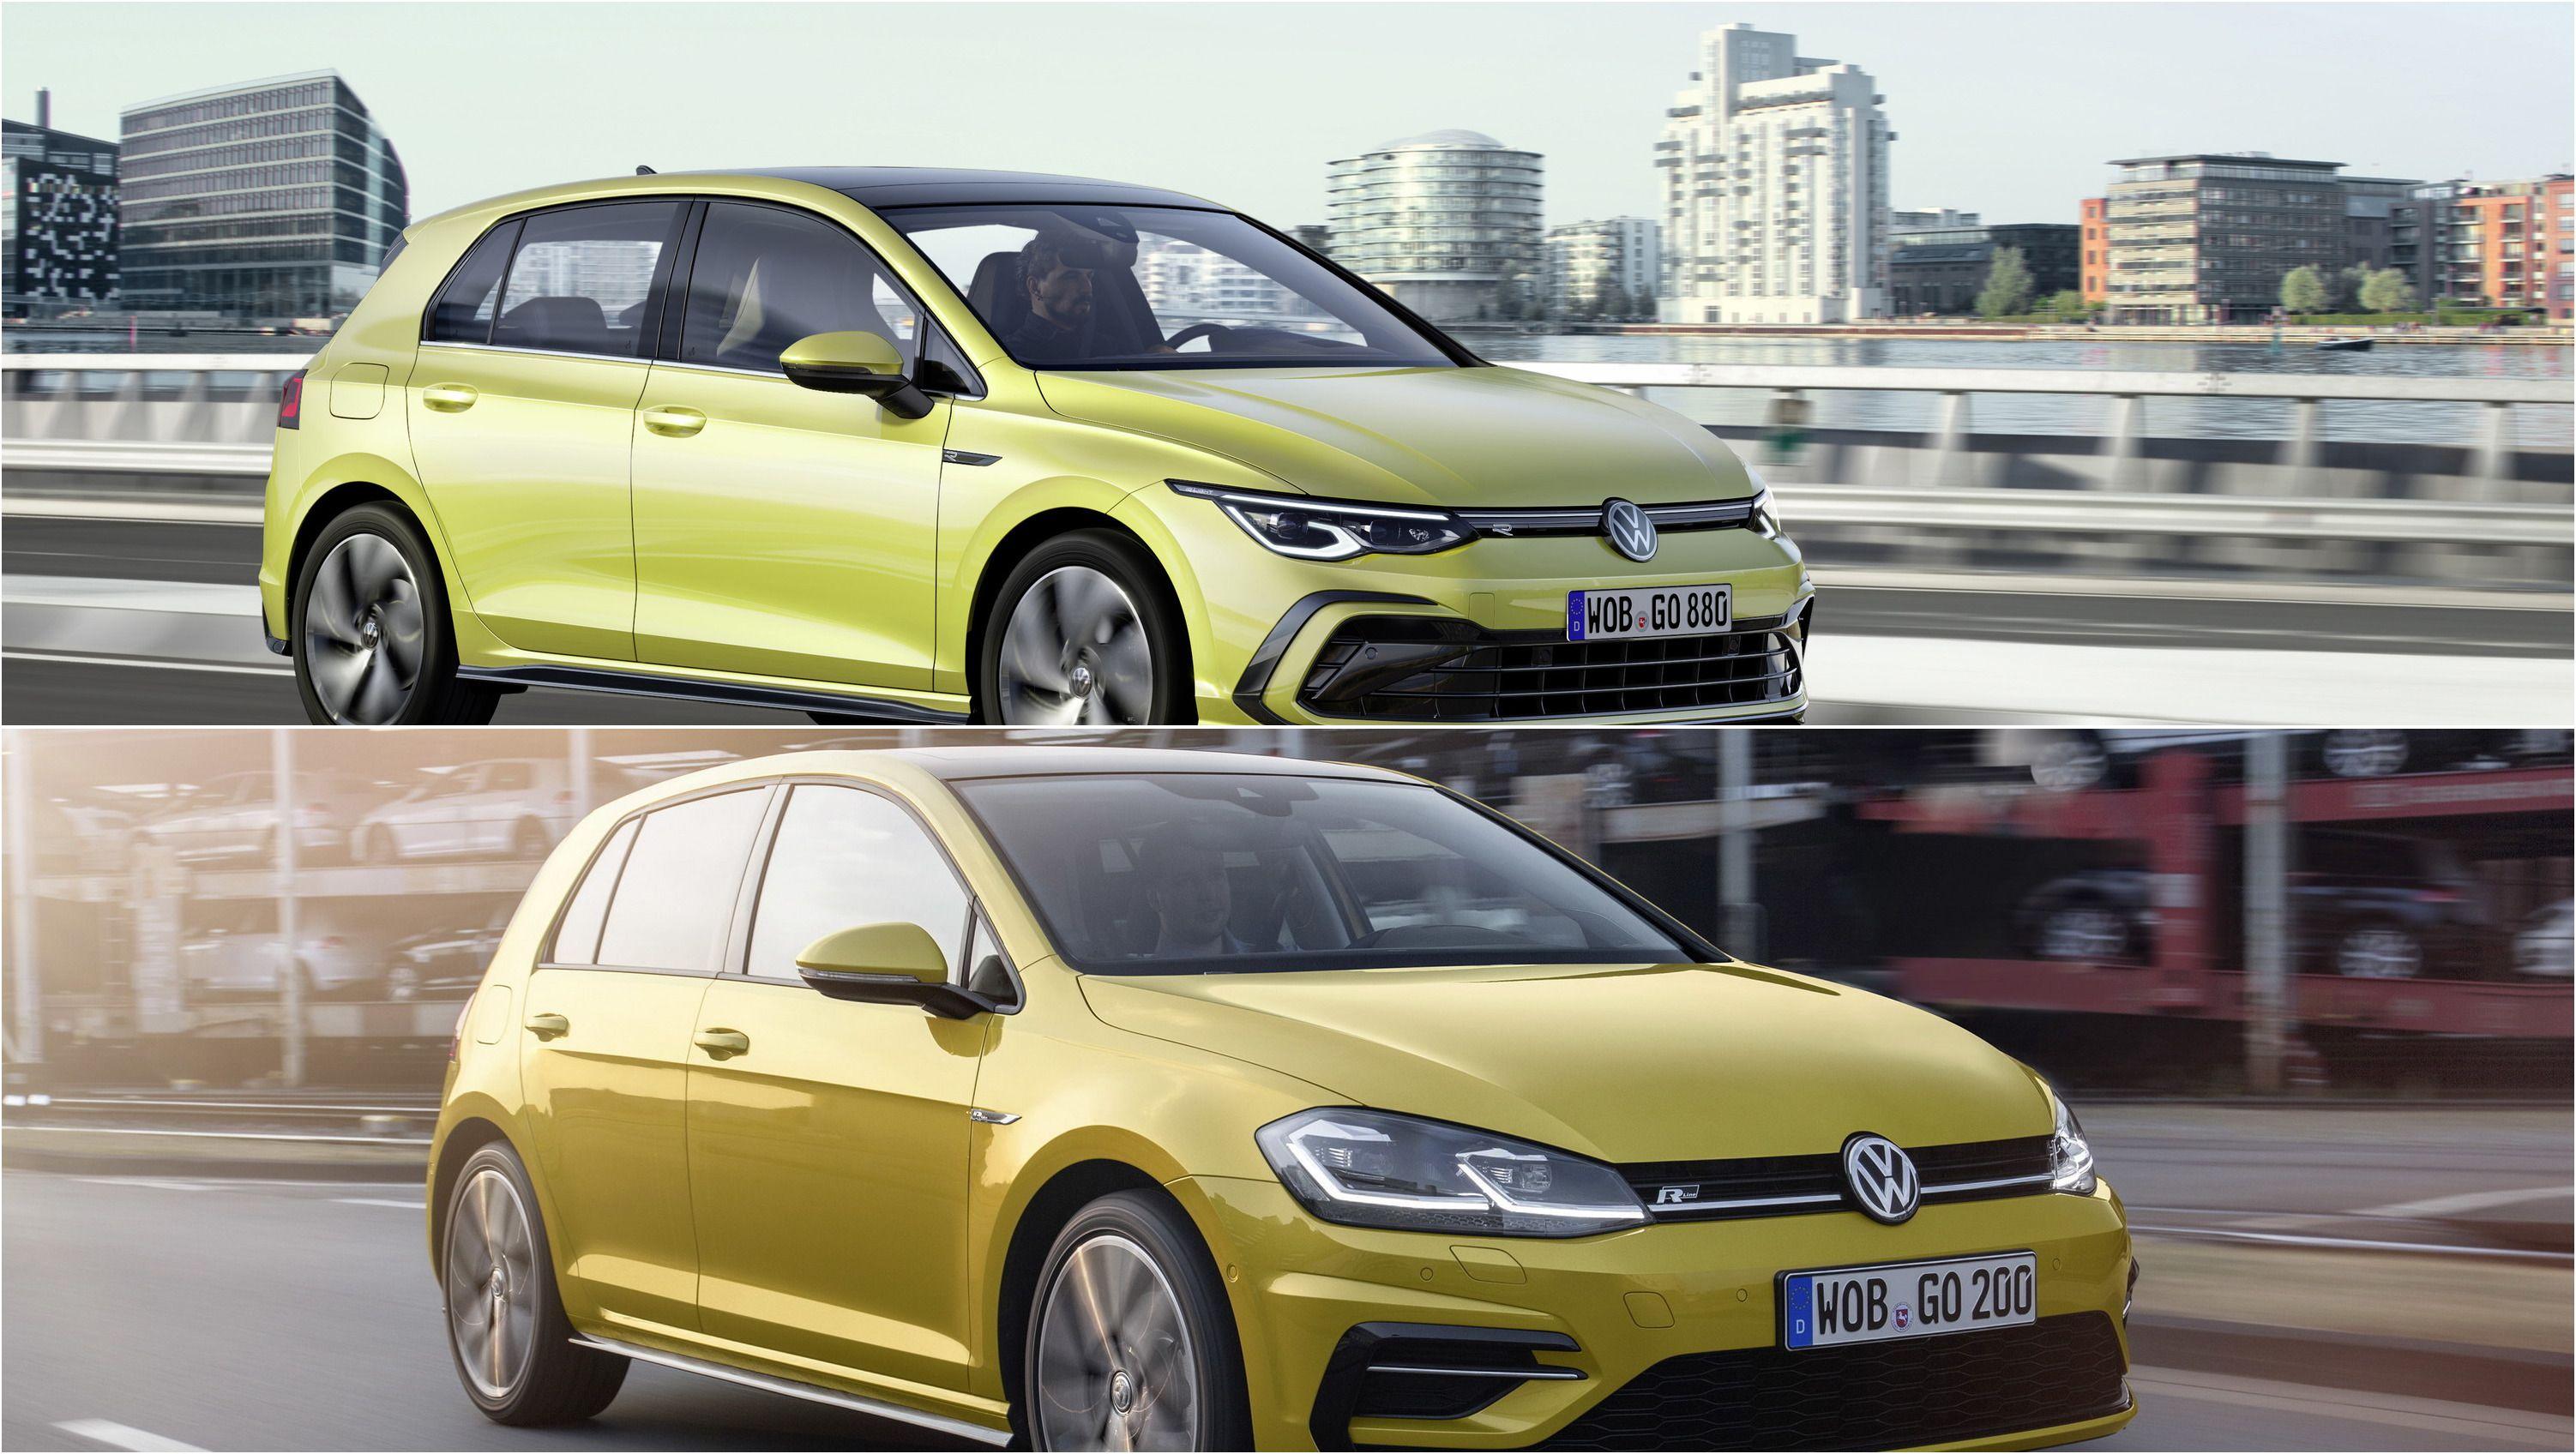 Volkswagen Golf Mk8 Vs Mk7 A Design Comparison Volkswagen